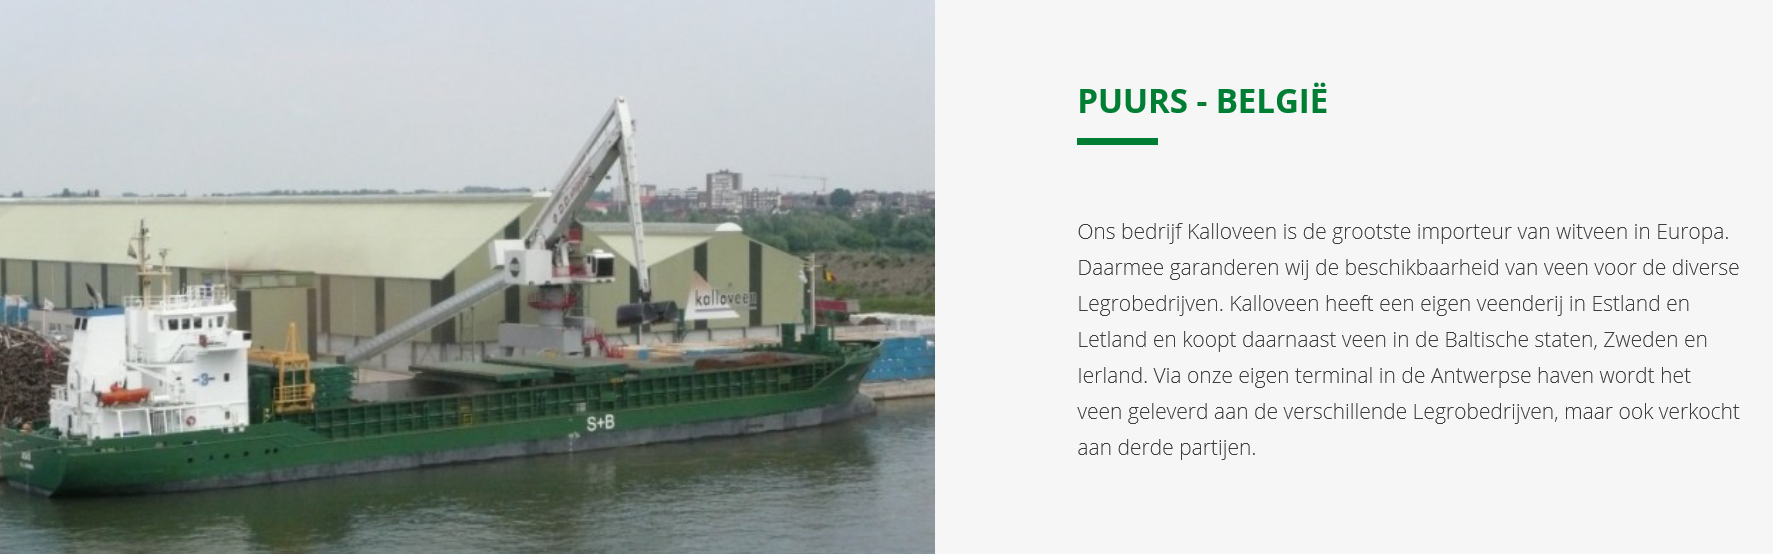 Puurs-Belgie-2